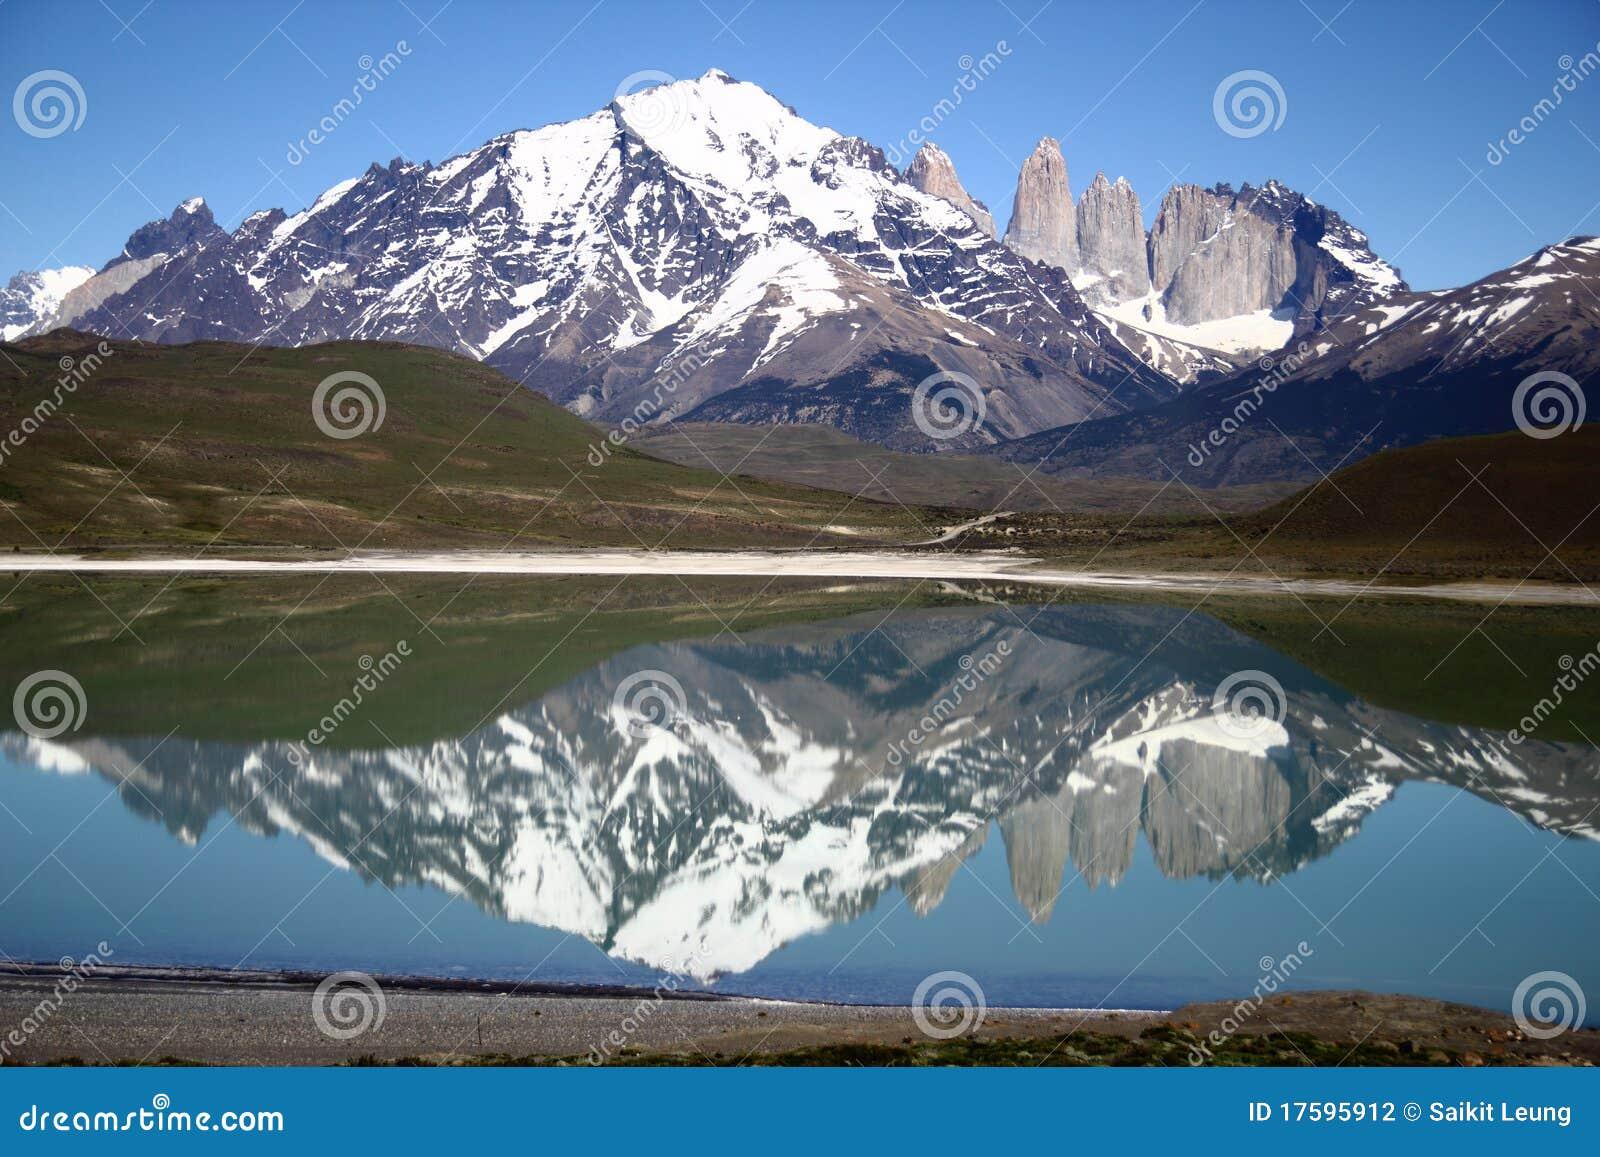 Stationnement national de Torres del Paine, Patagonia, Chili